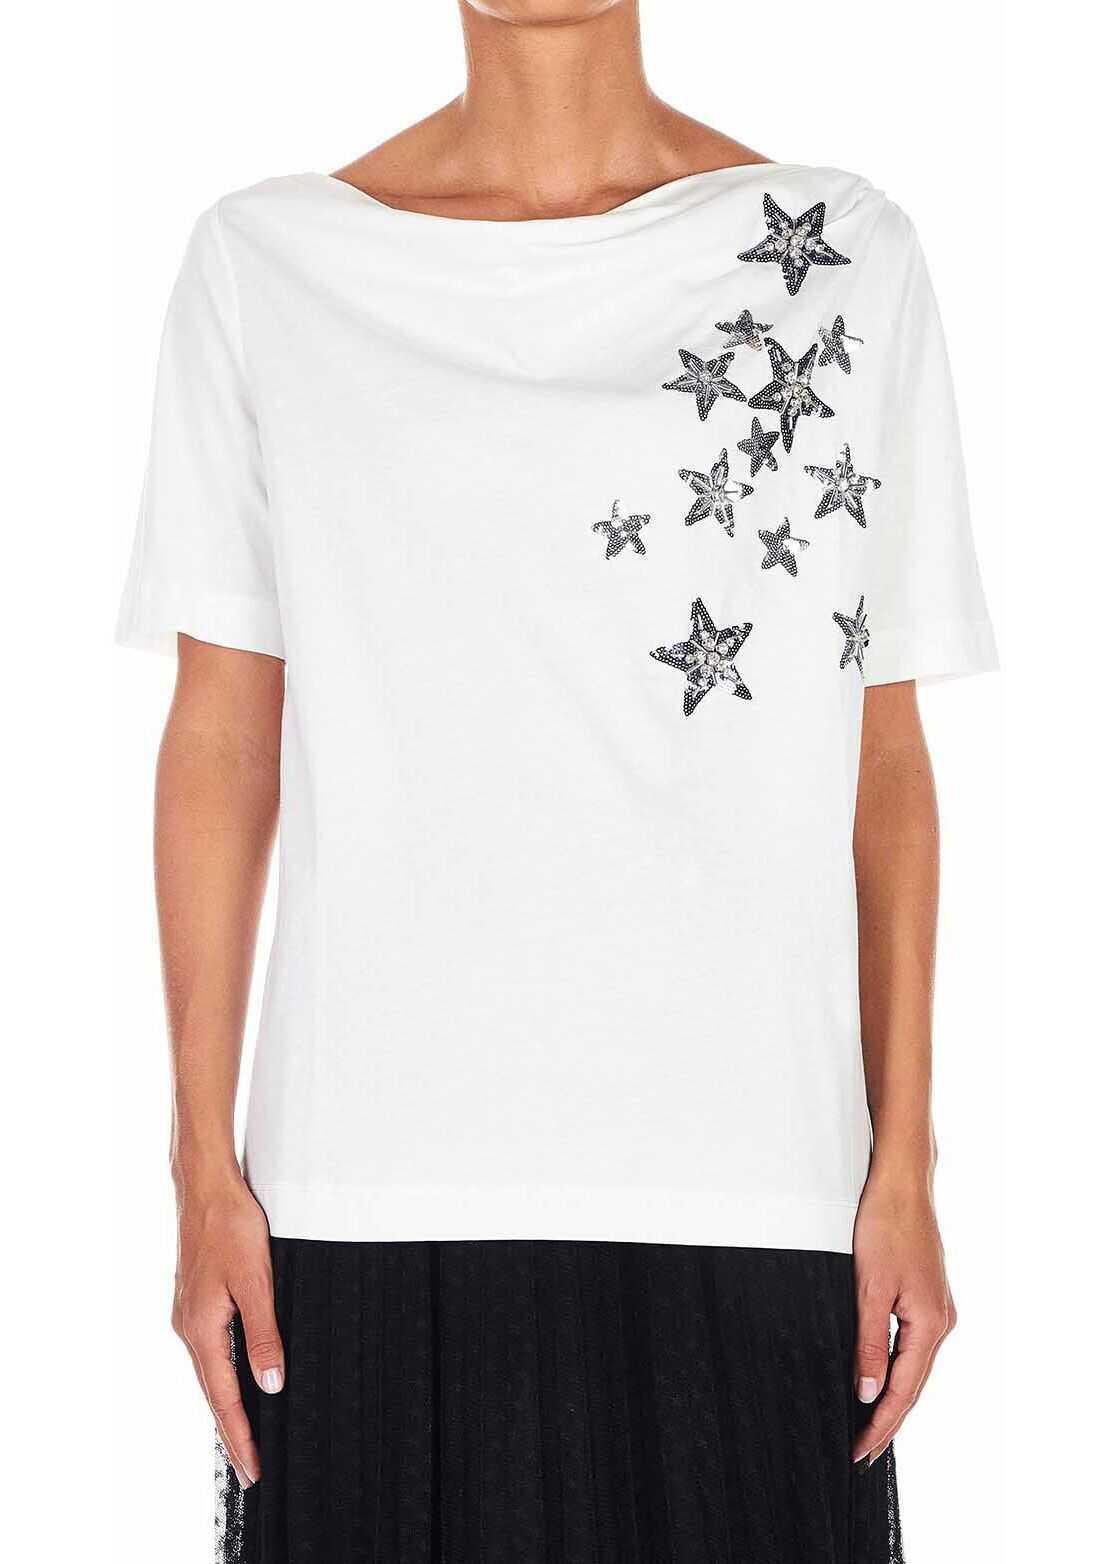 Liu Jo Shirt with glitter details White